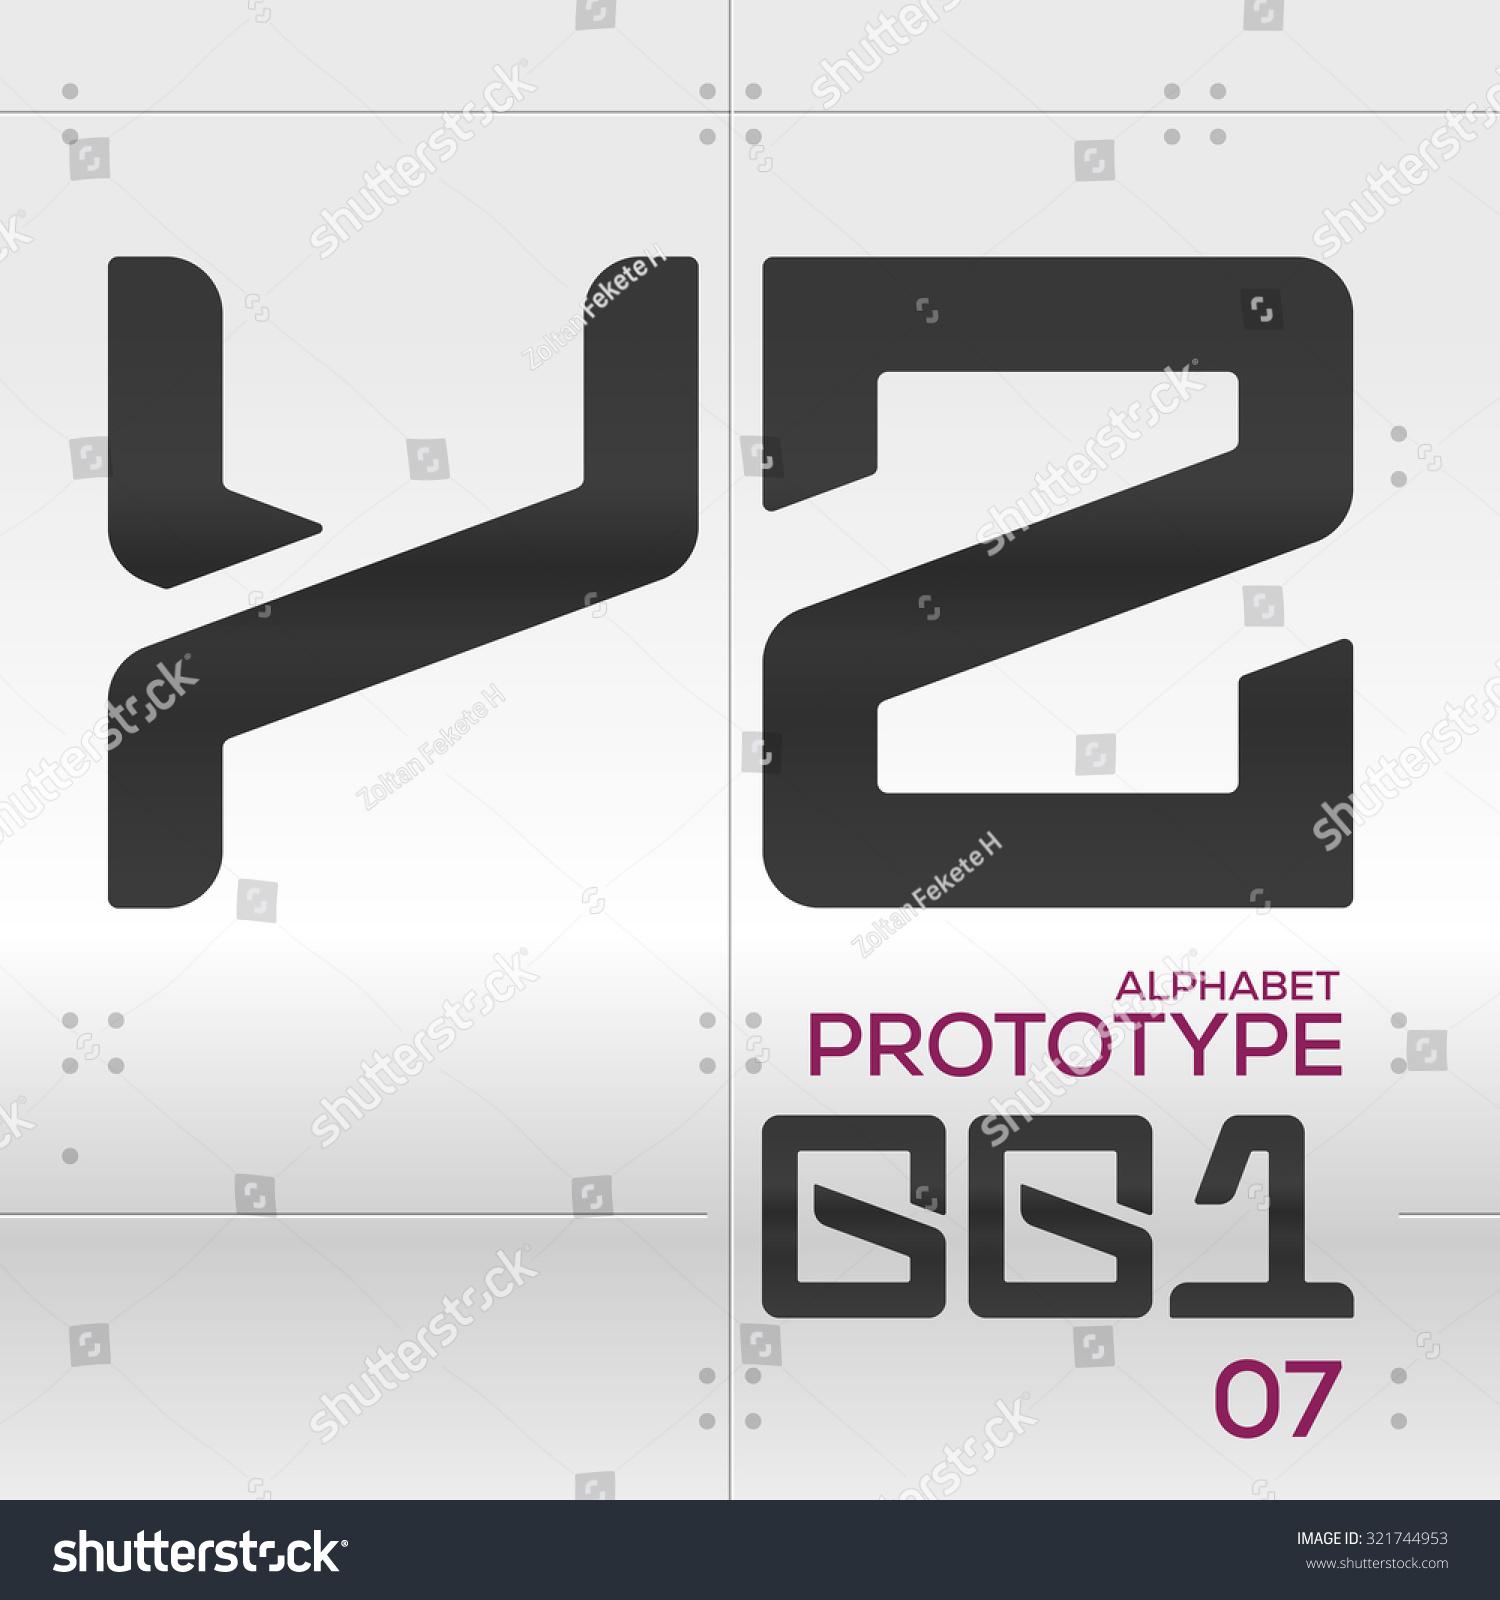 Prototype Vector Graphic Alphabet Set Y Stock Vector ...  Prototype Vecto...